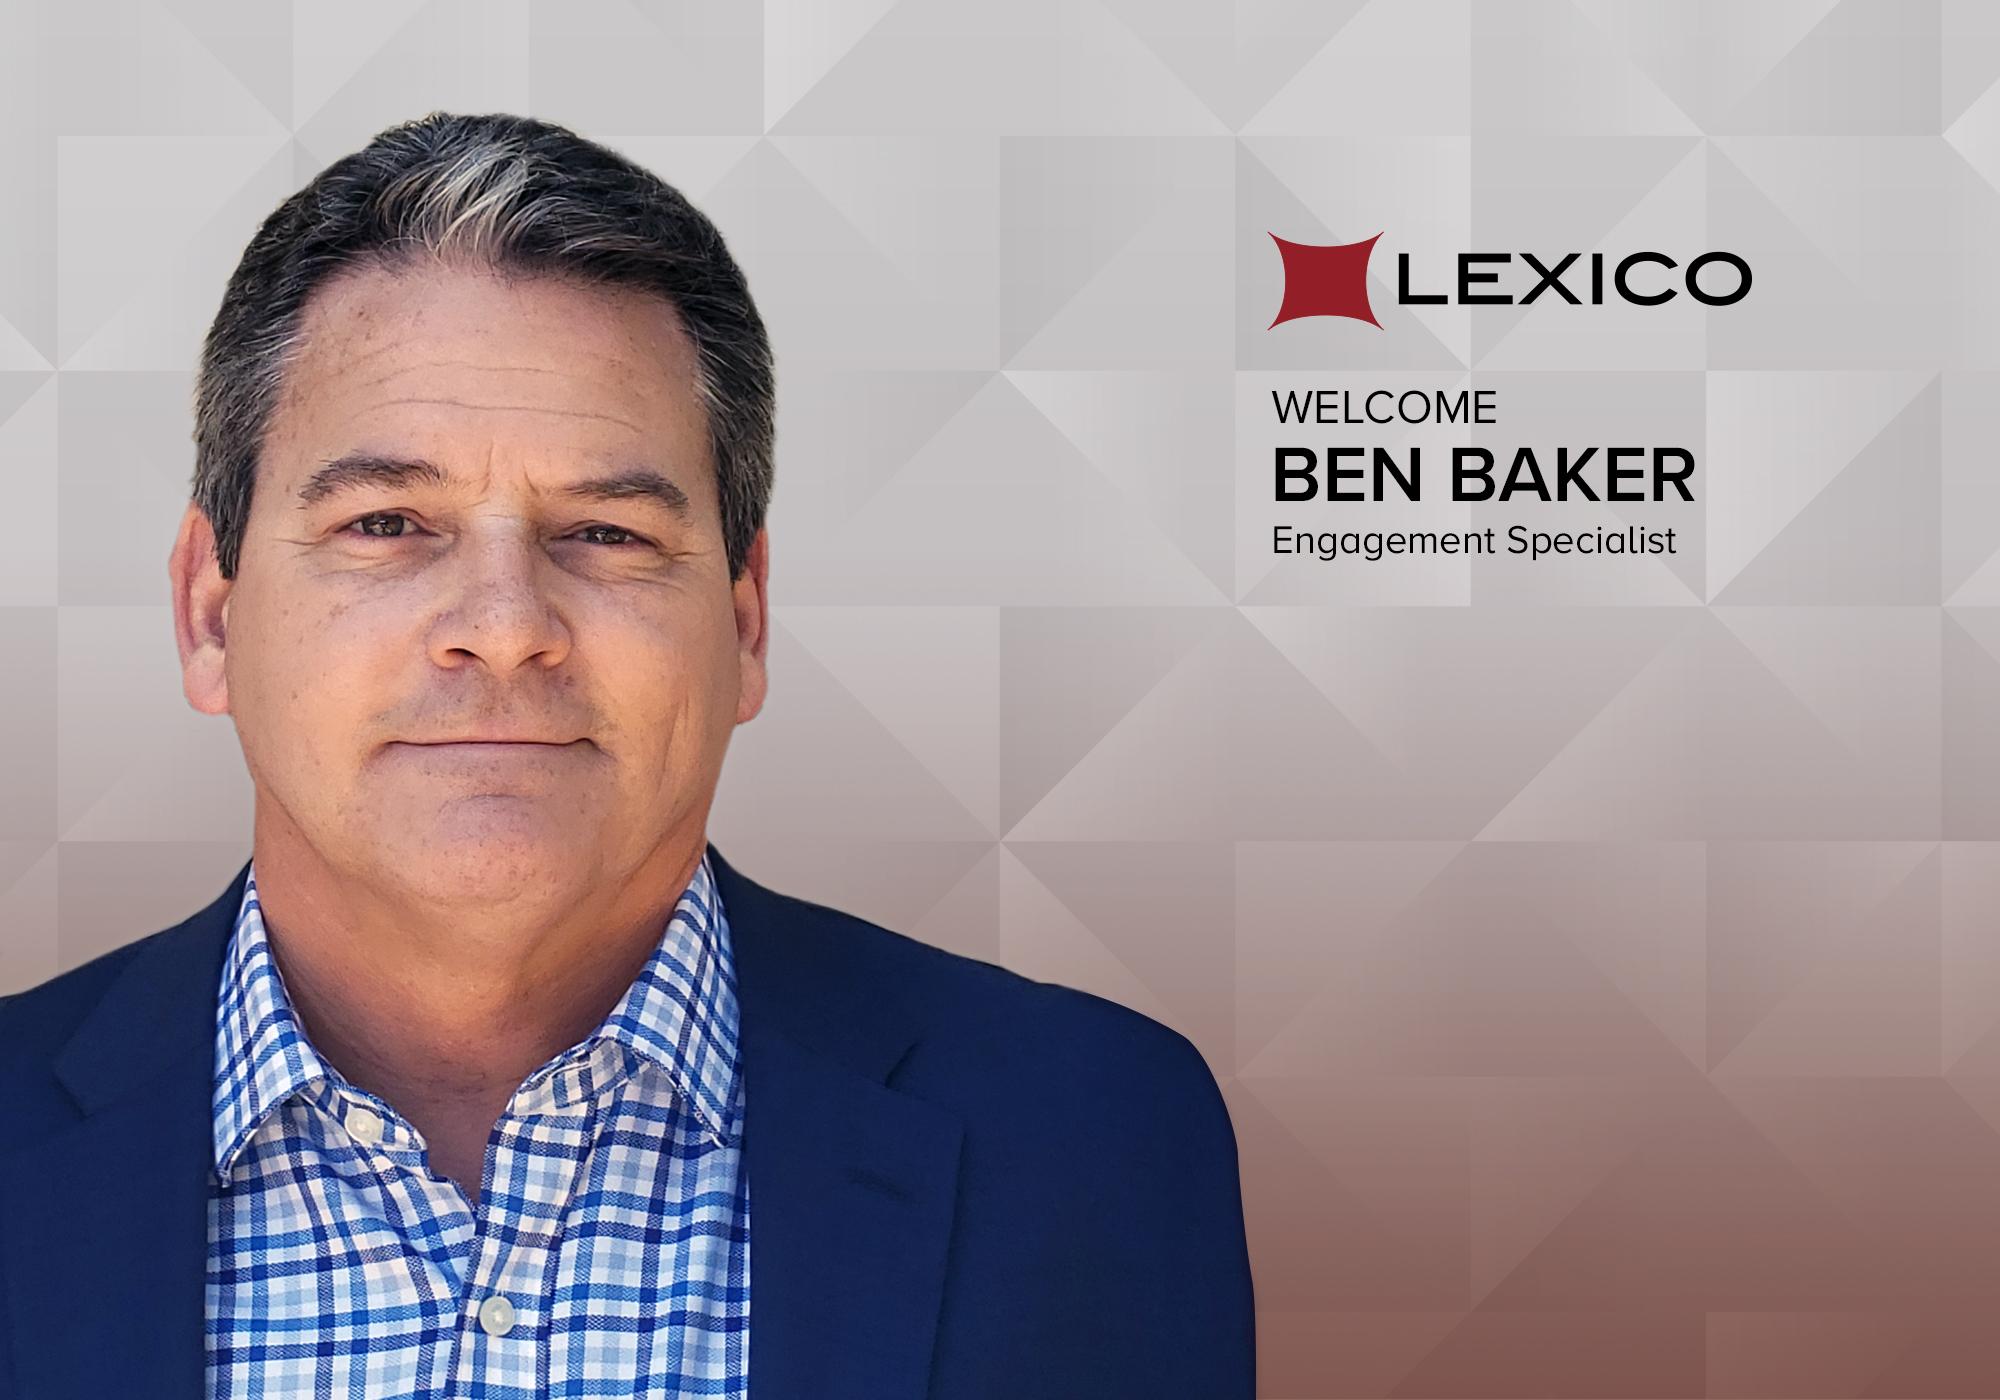 Ben Baker, Engagement Specialist, Lexico